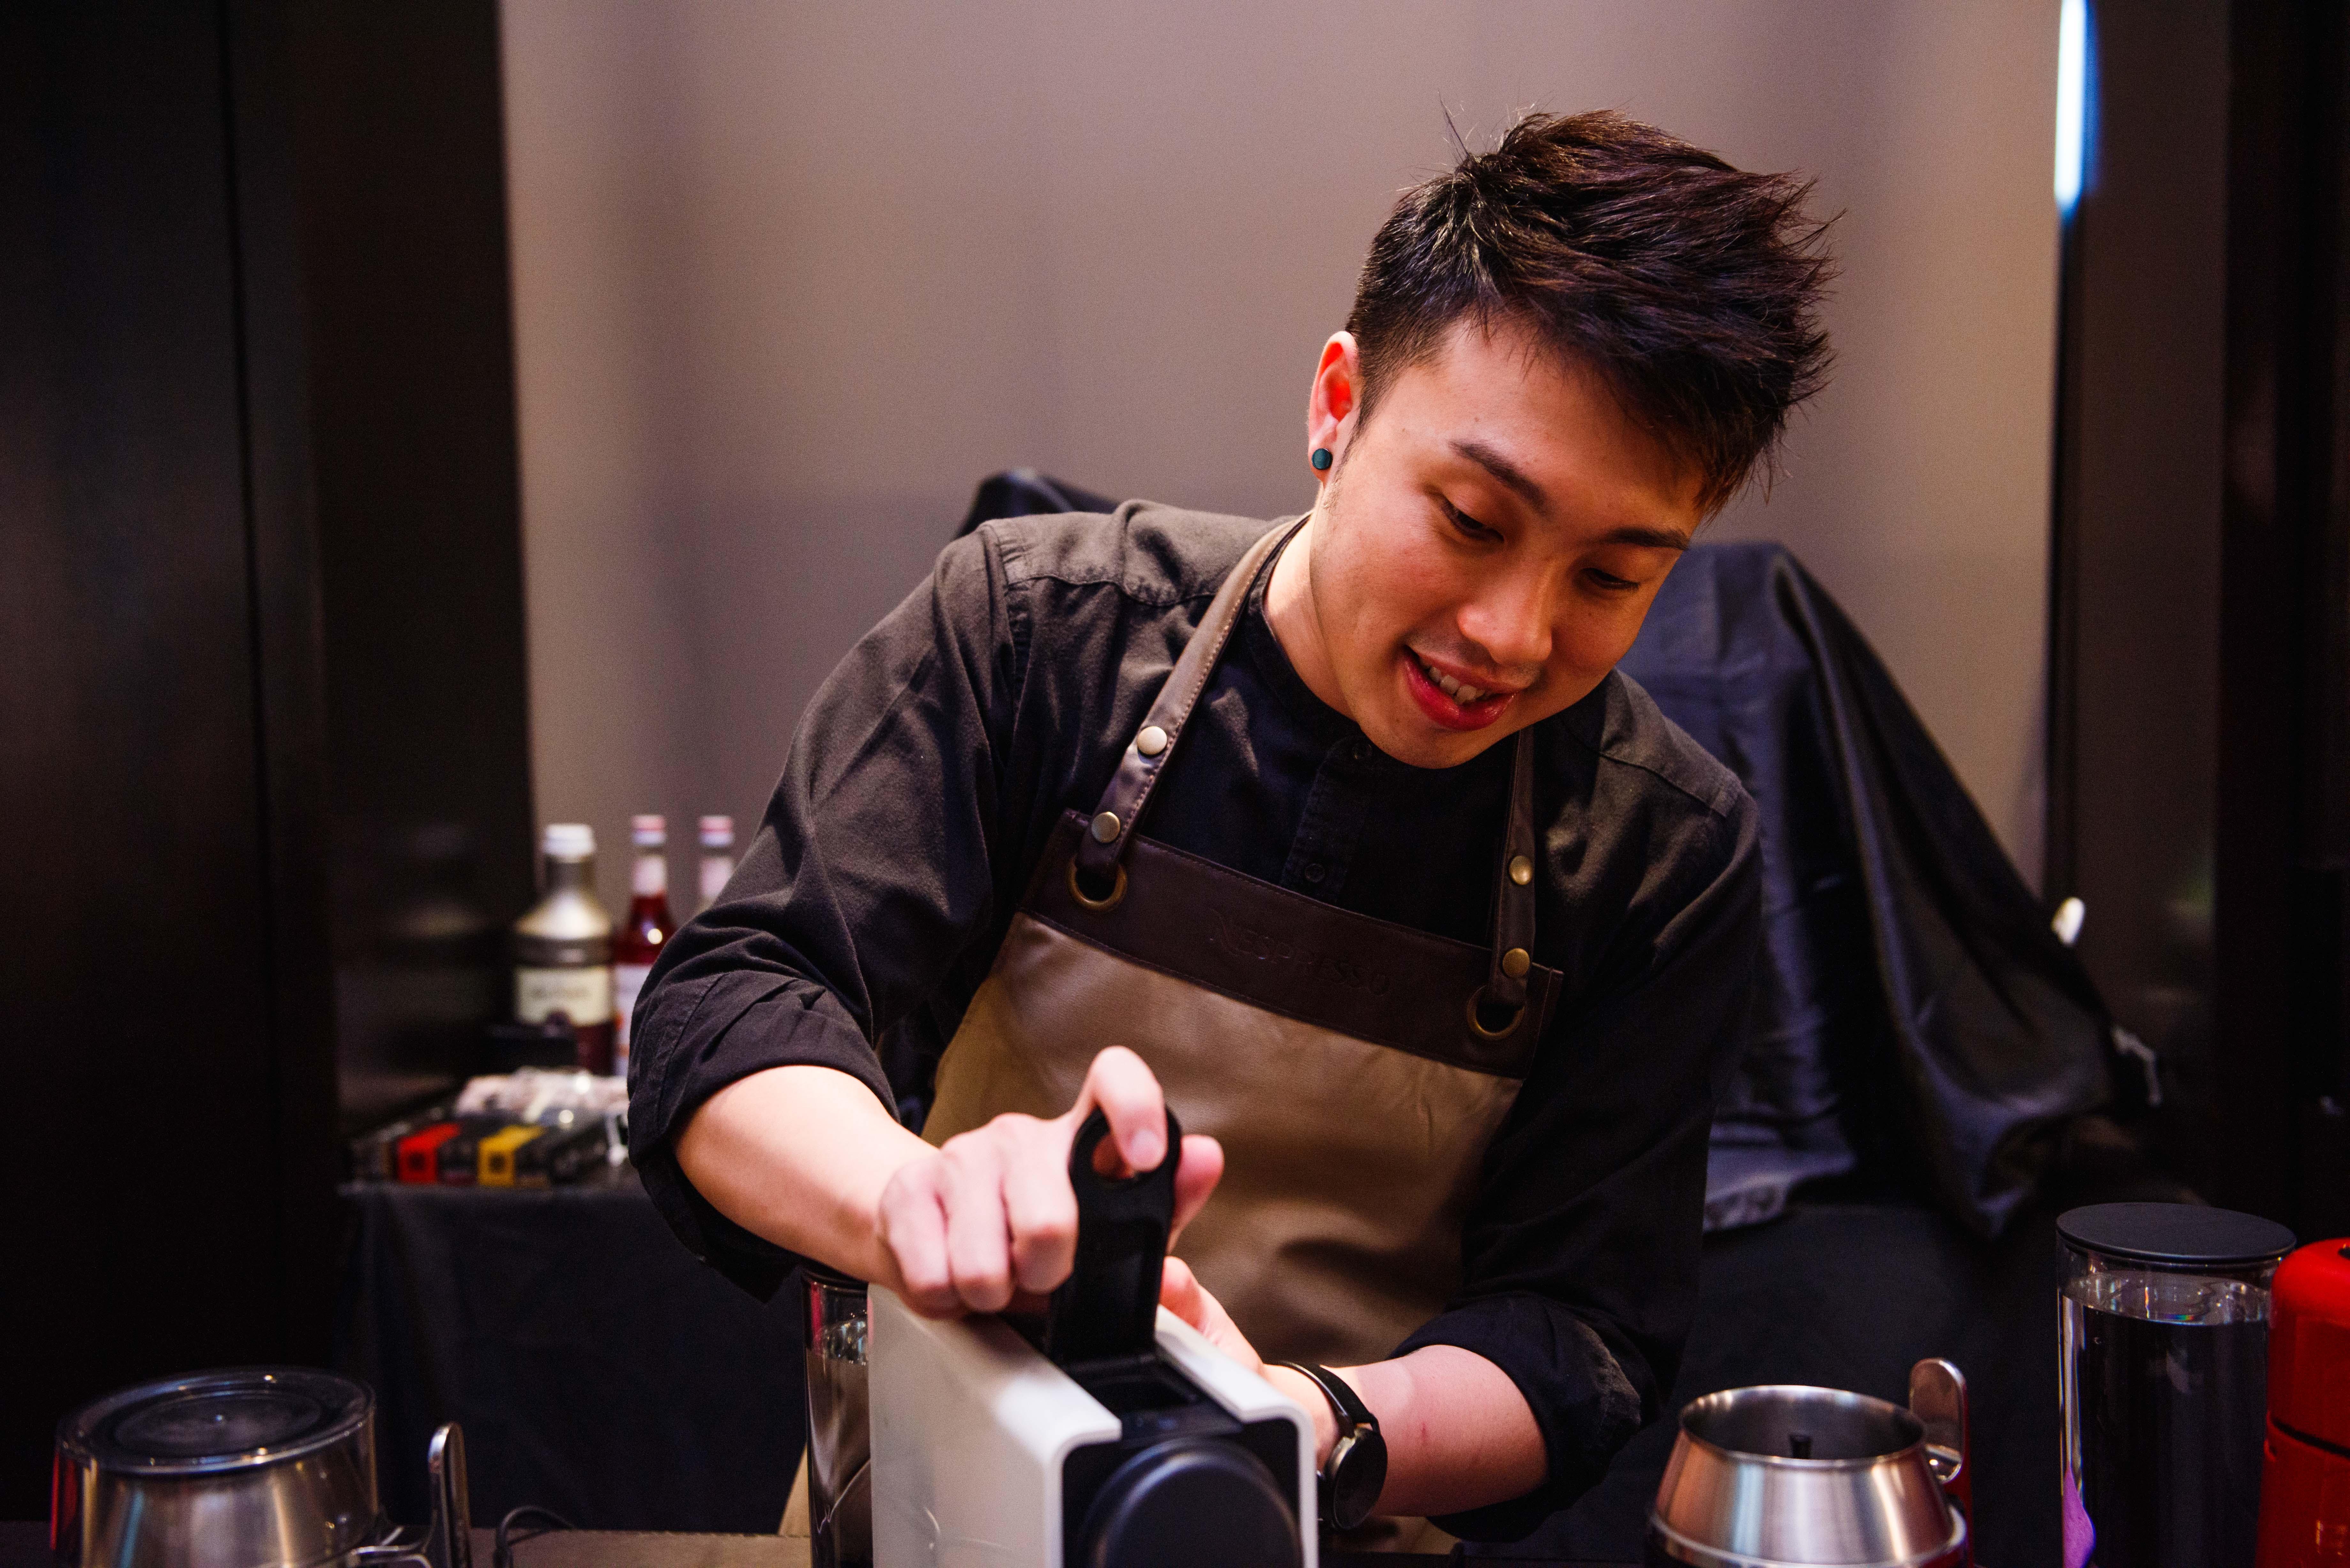 Award-winning barista Shaun Liew showing guests how it's done